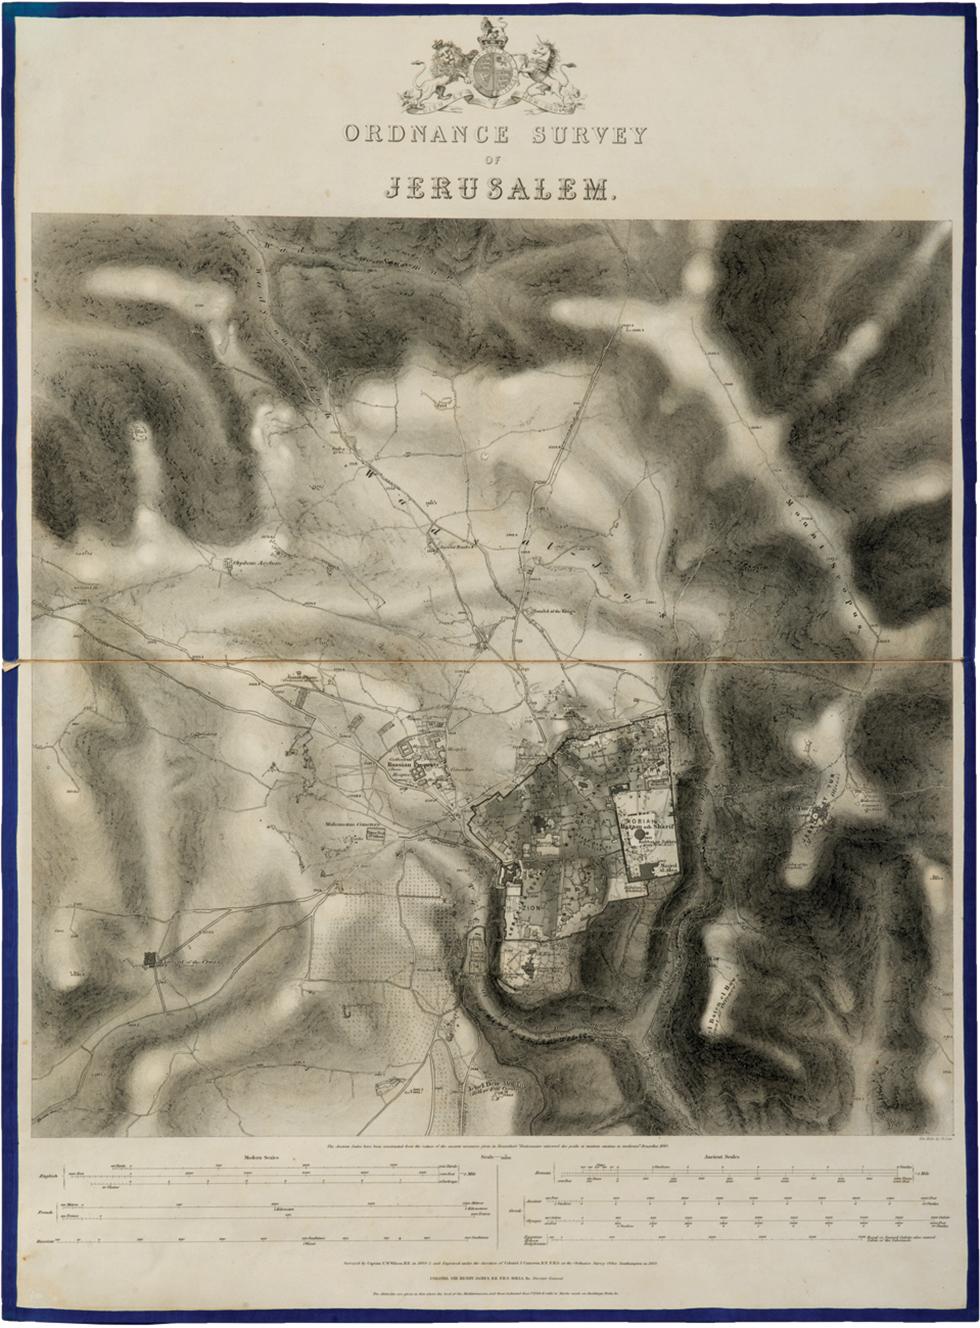 Captain Charles Wilson cartograhic survey of Jerusalem (Kedem auction house)